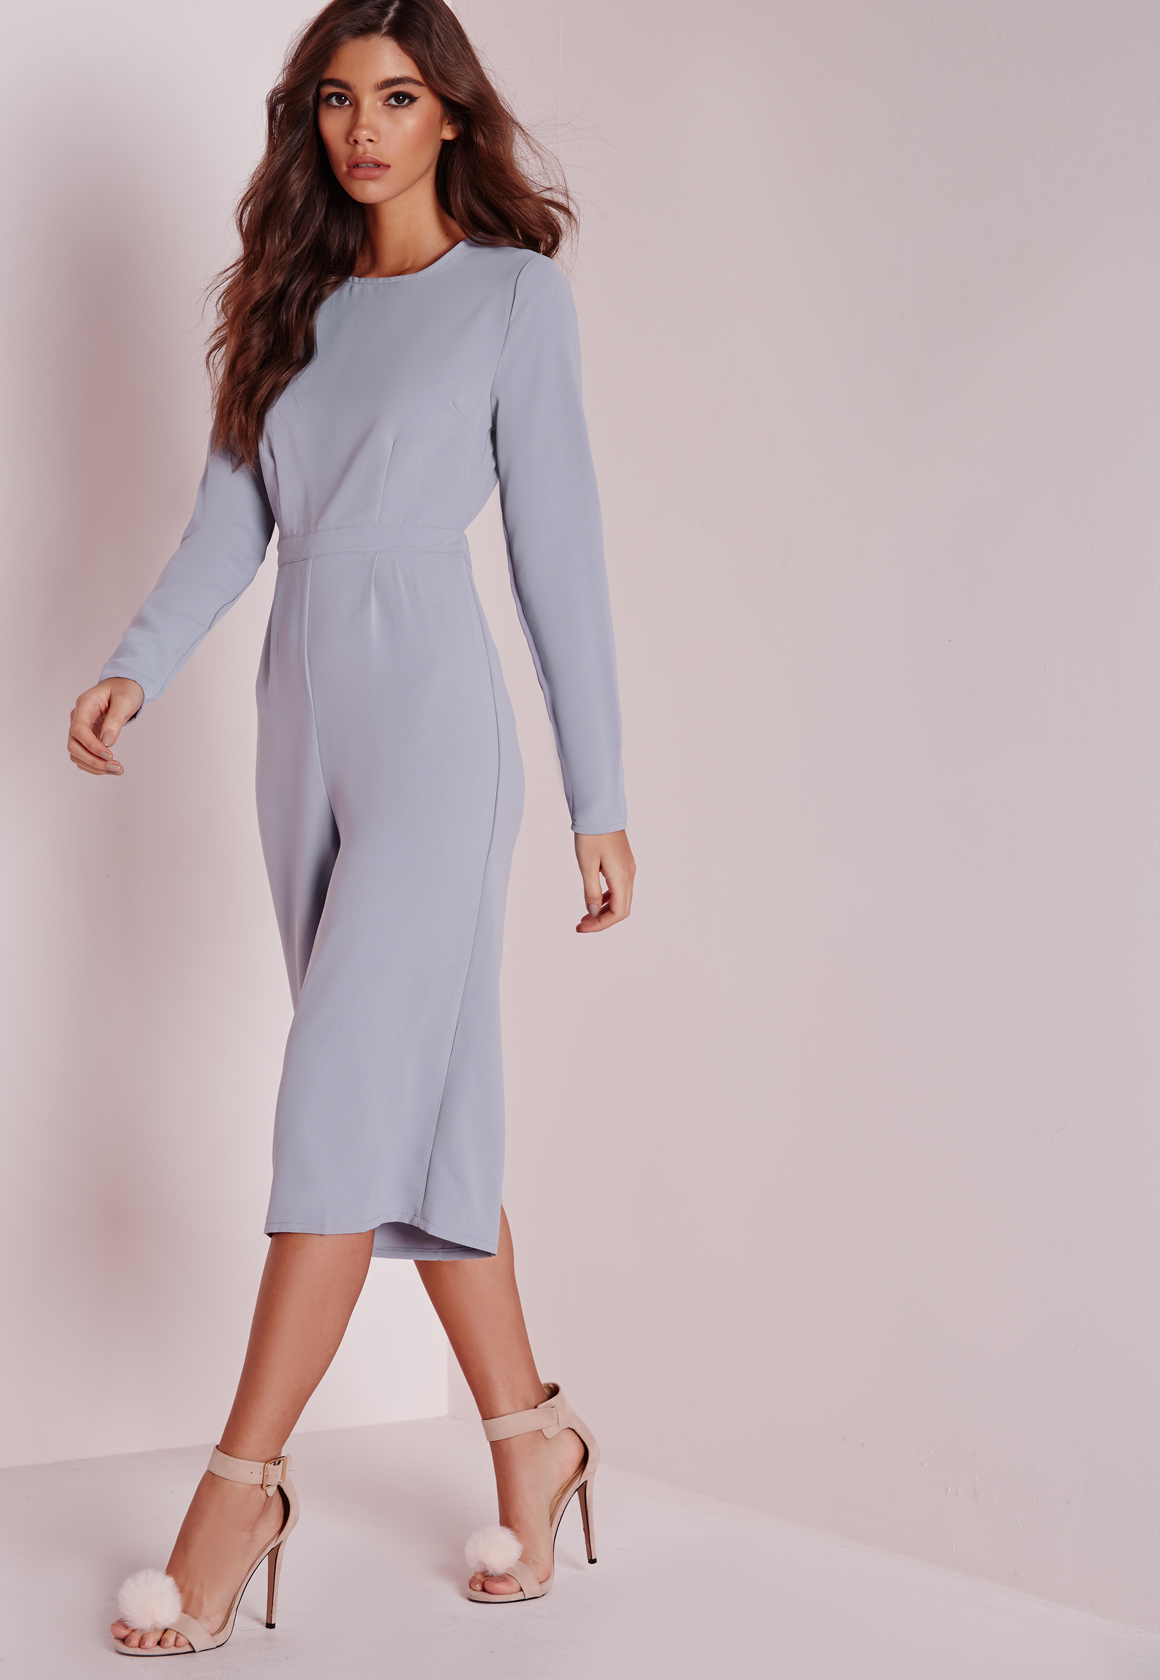 2b90b8b849ec Missguided Open Back Long Sleeve Culotte Jumpsuit Grey in Gray - Lyst